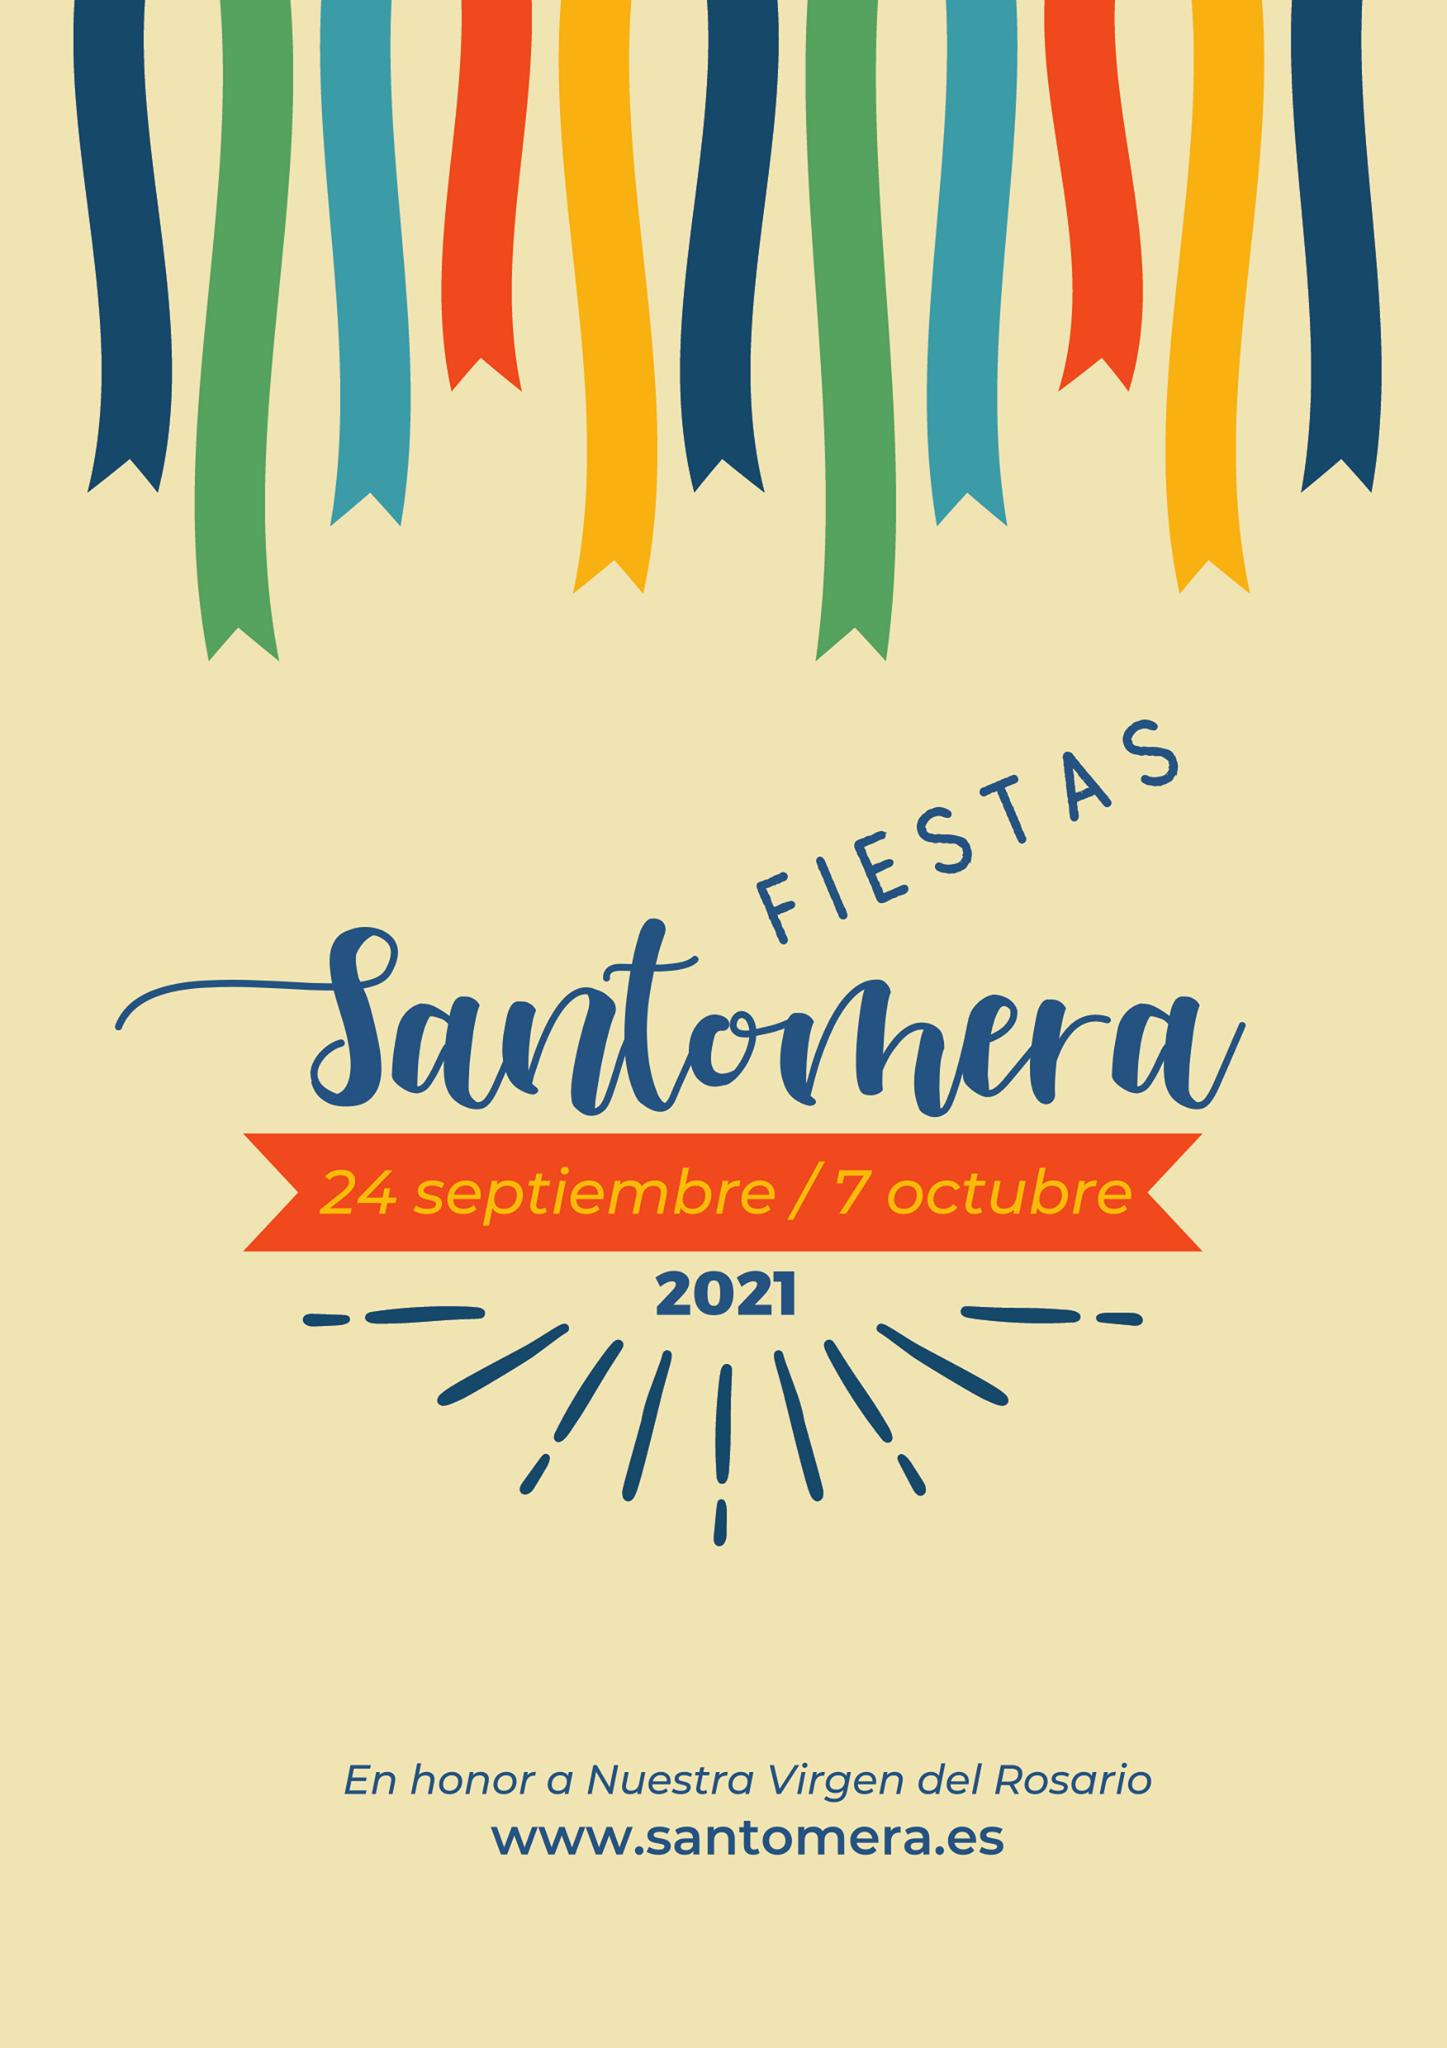 fiestas-santomera.png